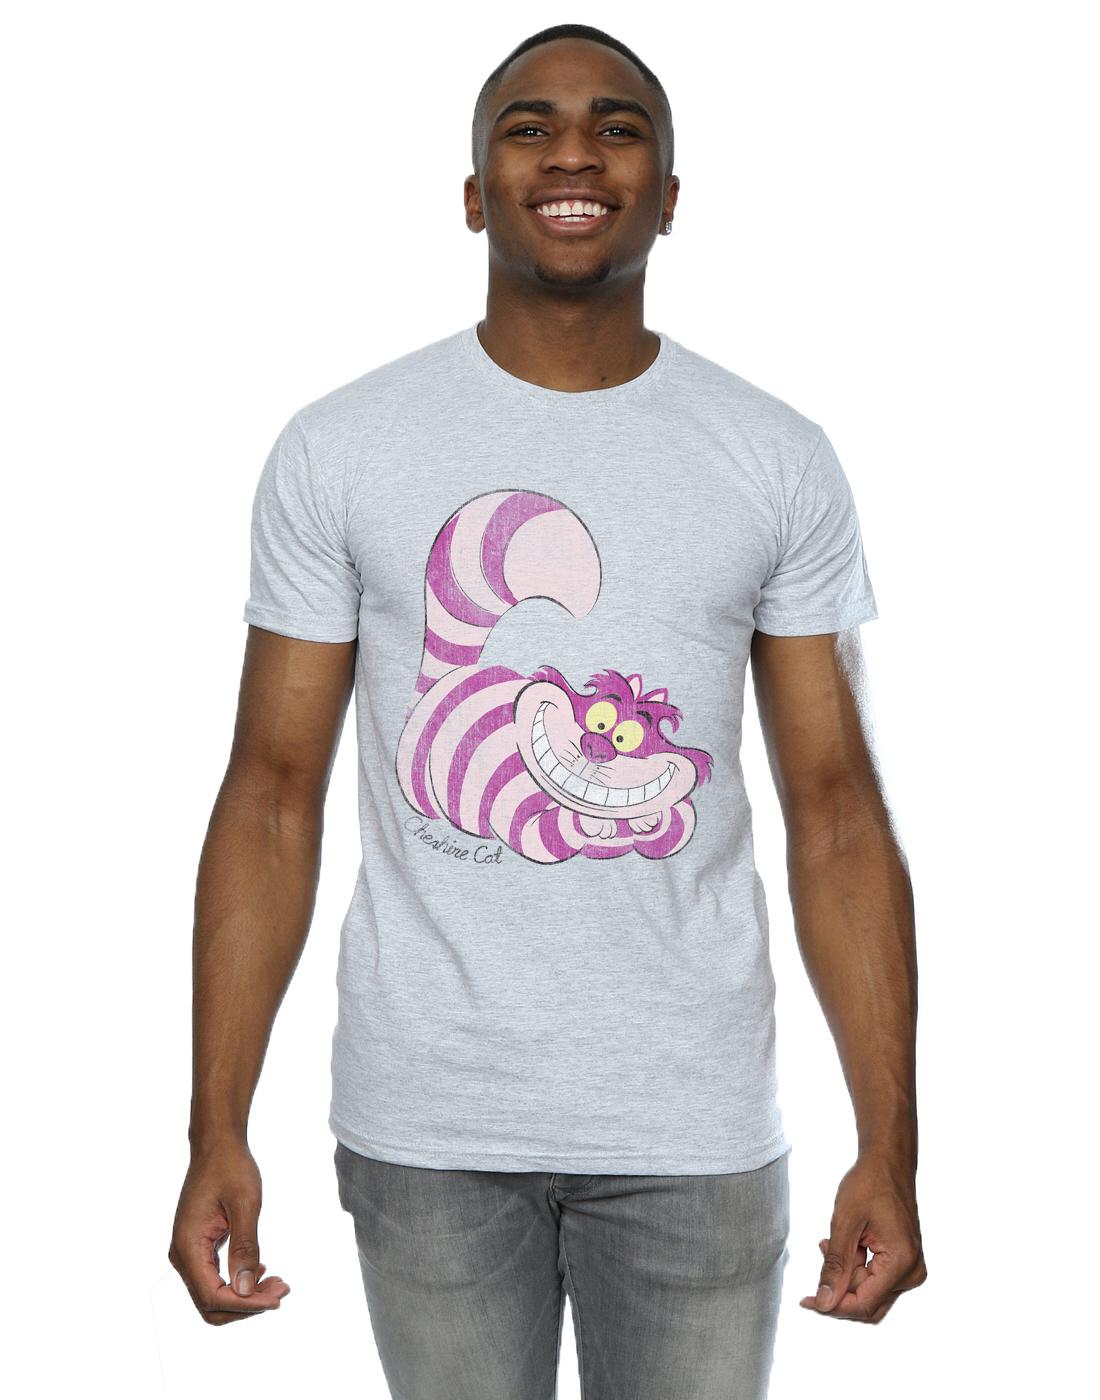 Disney-Homme-Alice-in-Wonderland-Cheshire-Cat-T-Shirt